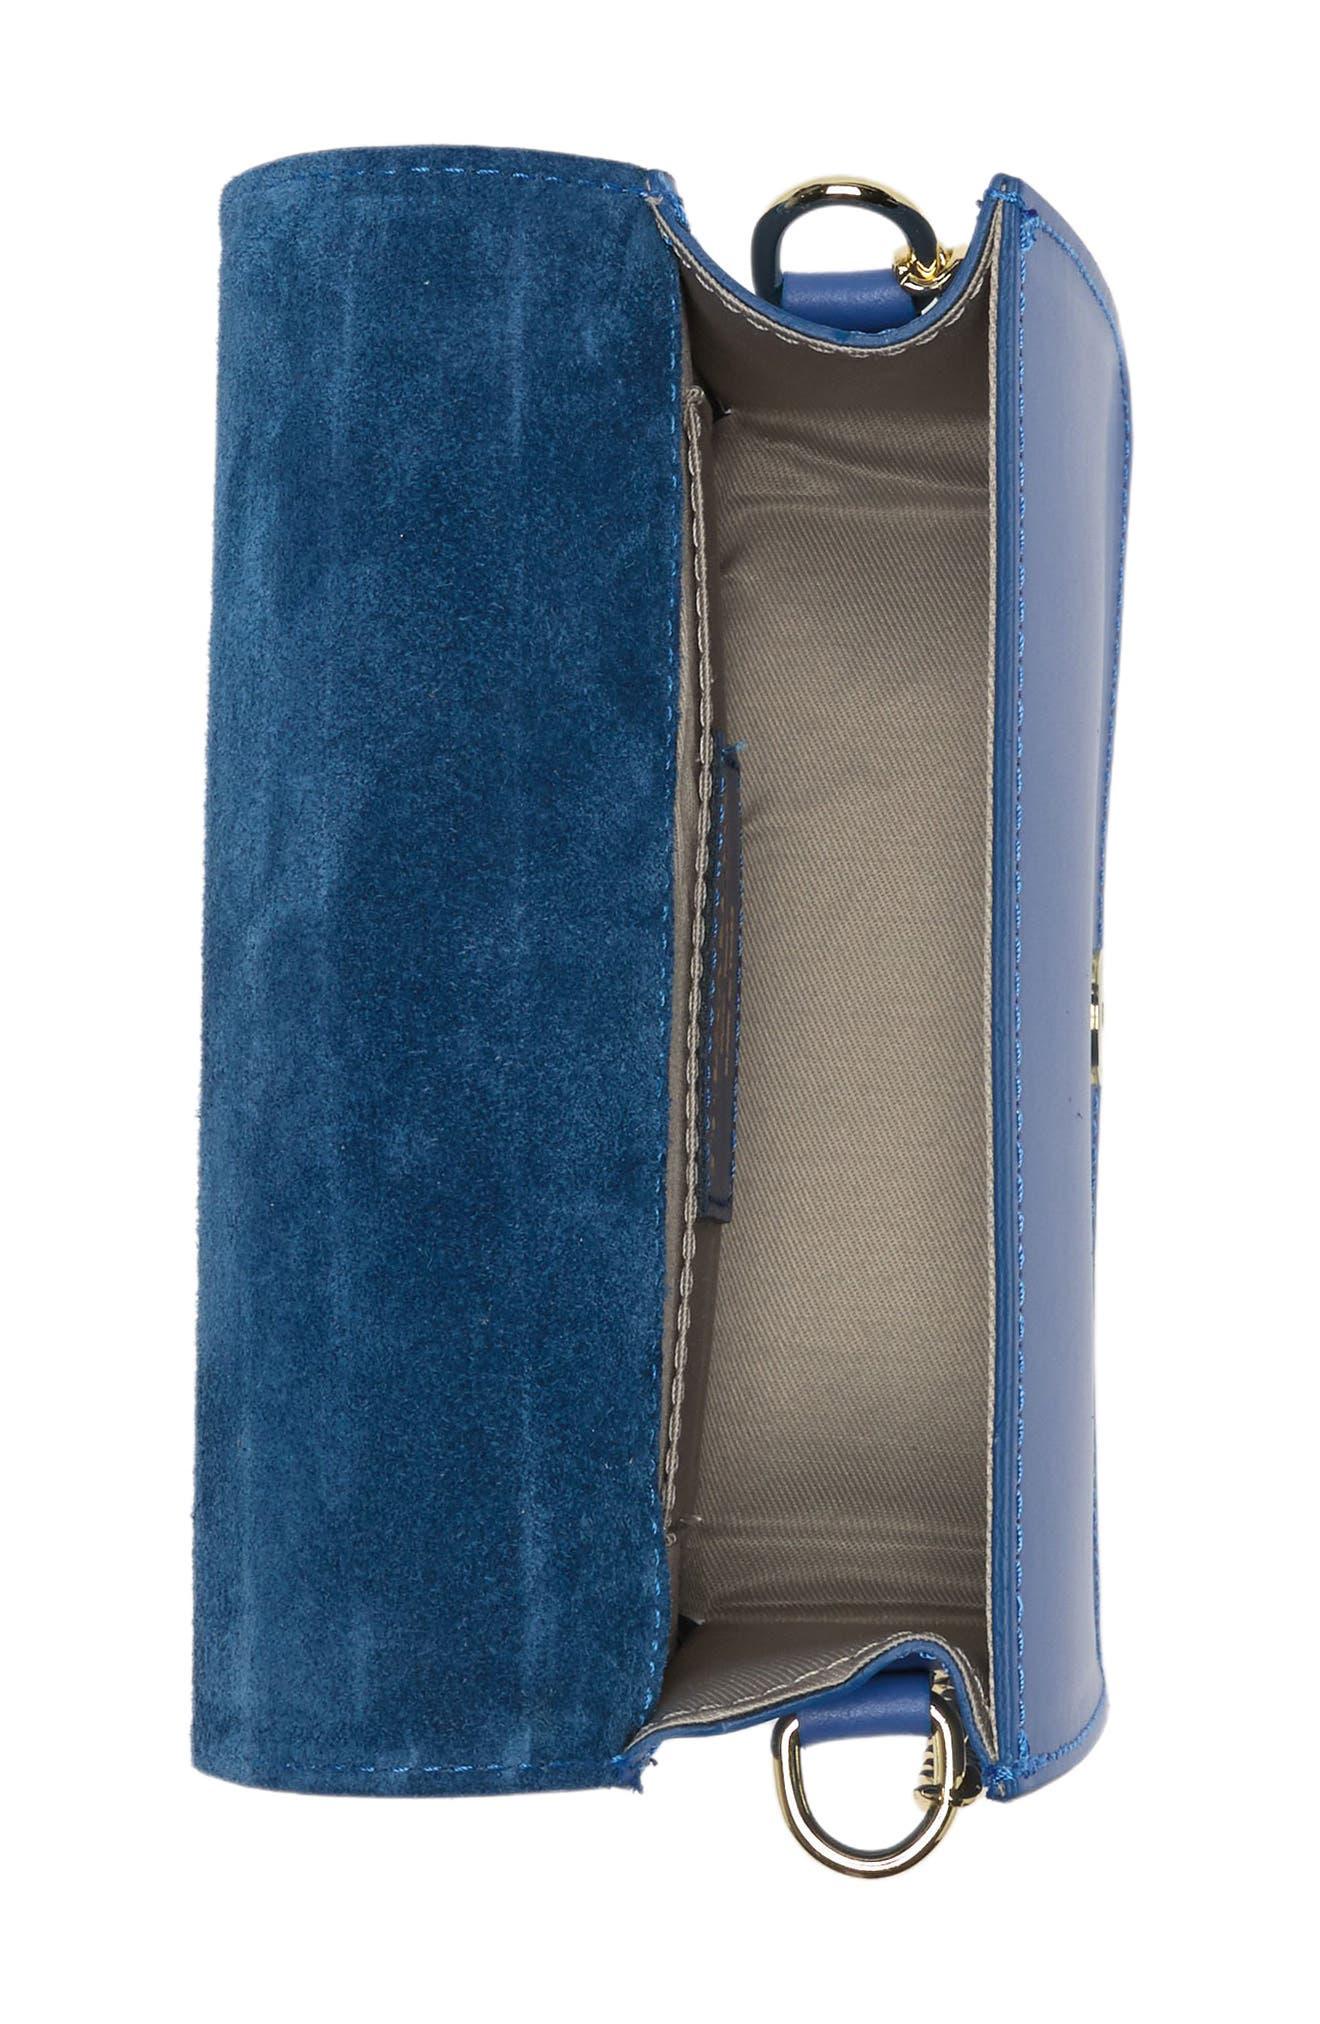 Image of Persaman New York Lucie Studded Crossbody Bag